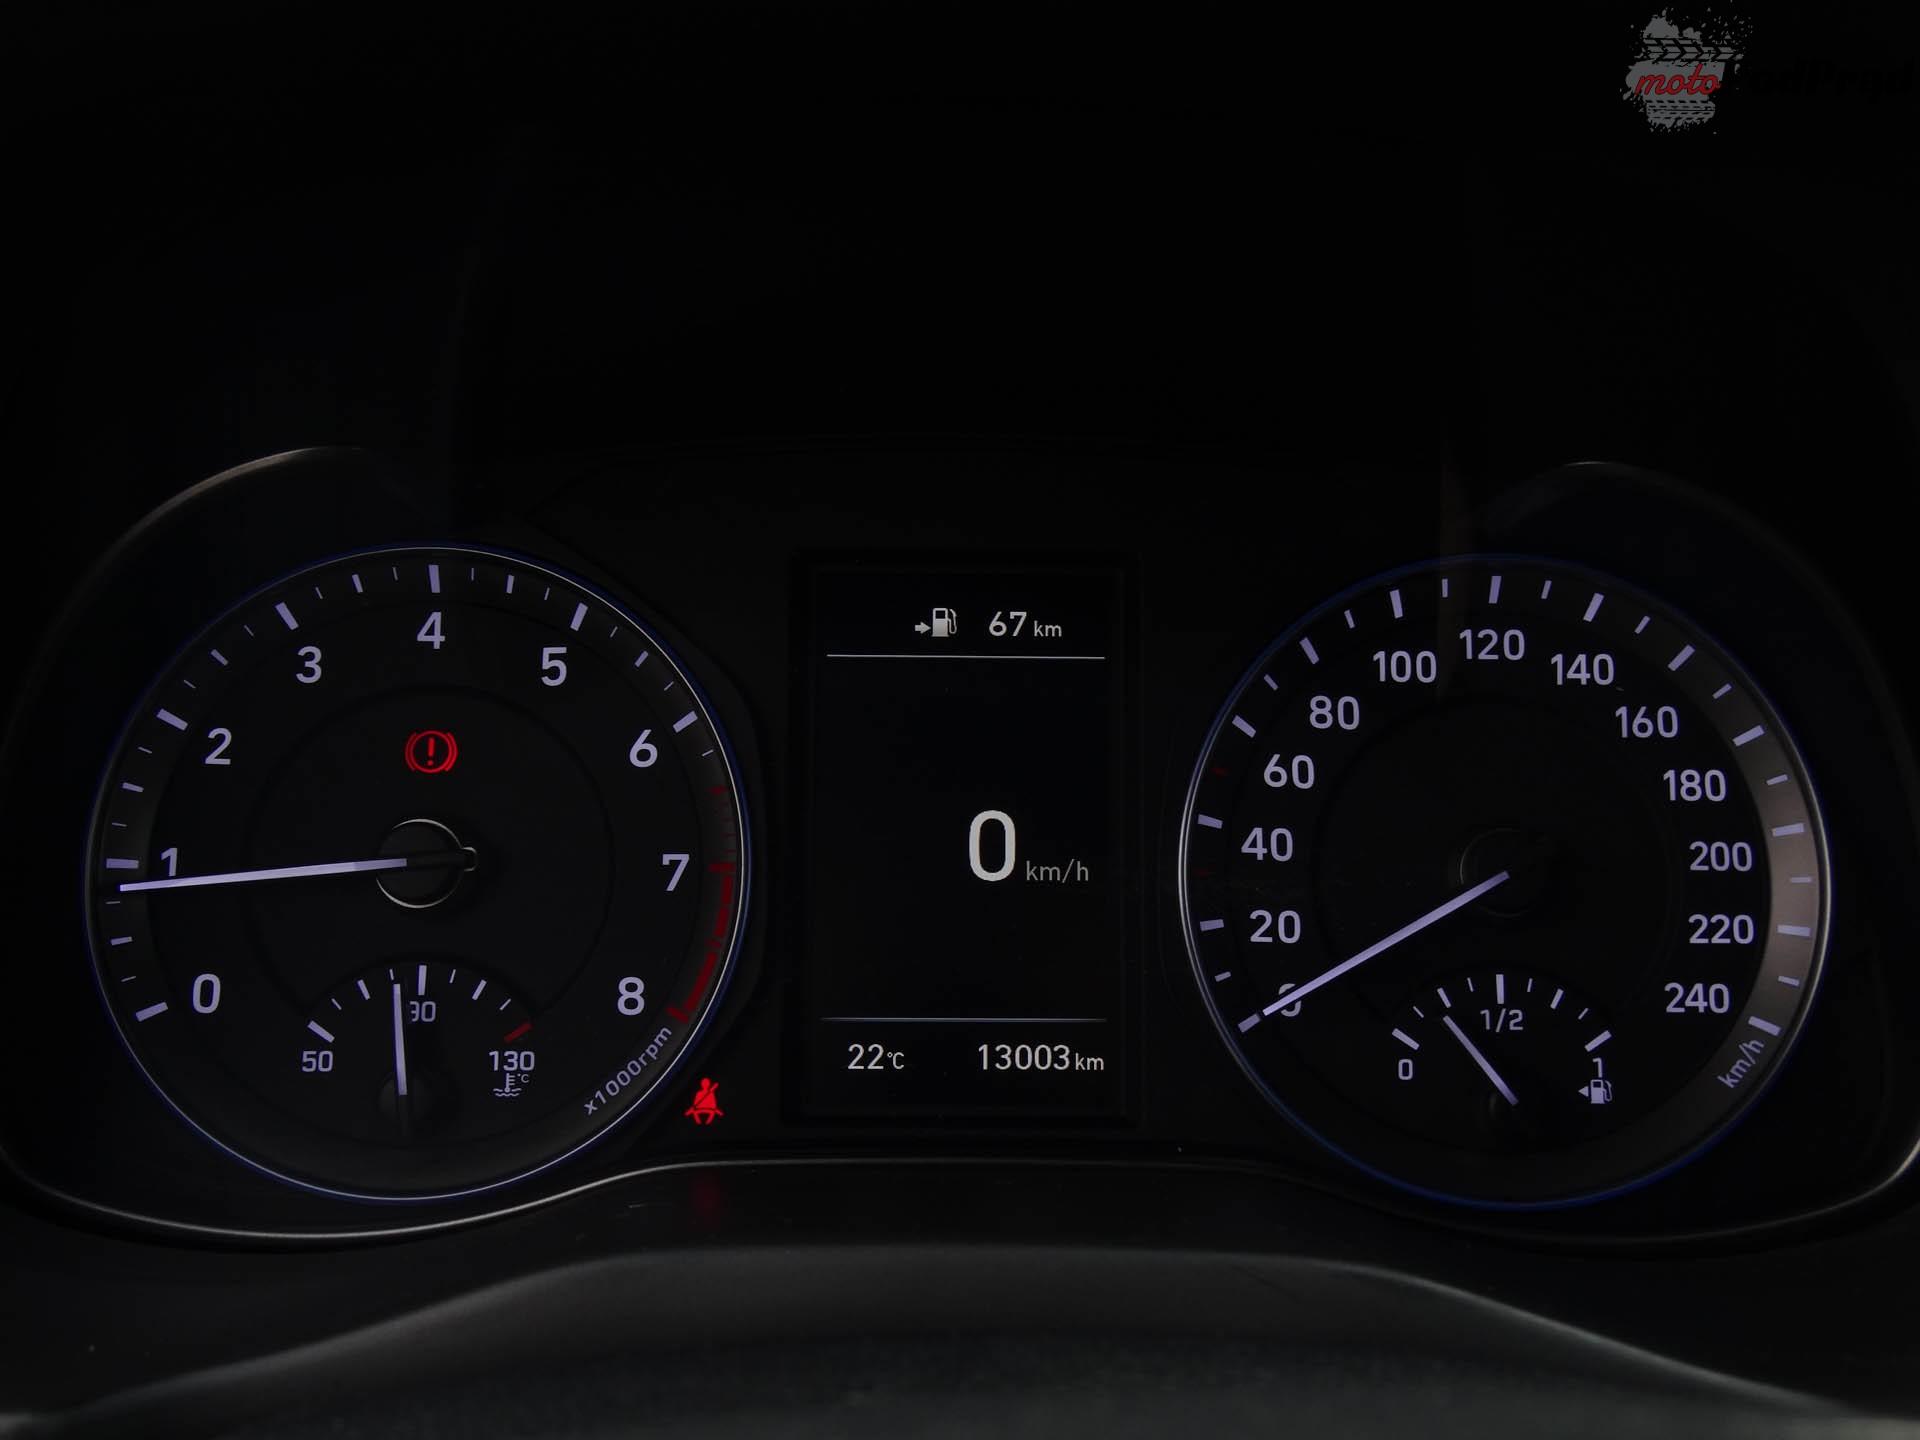 Hyundai Kona 17 Porównanie: Hyundai Kona 1.0 kontra Seat Arona 1.0